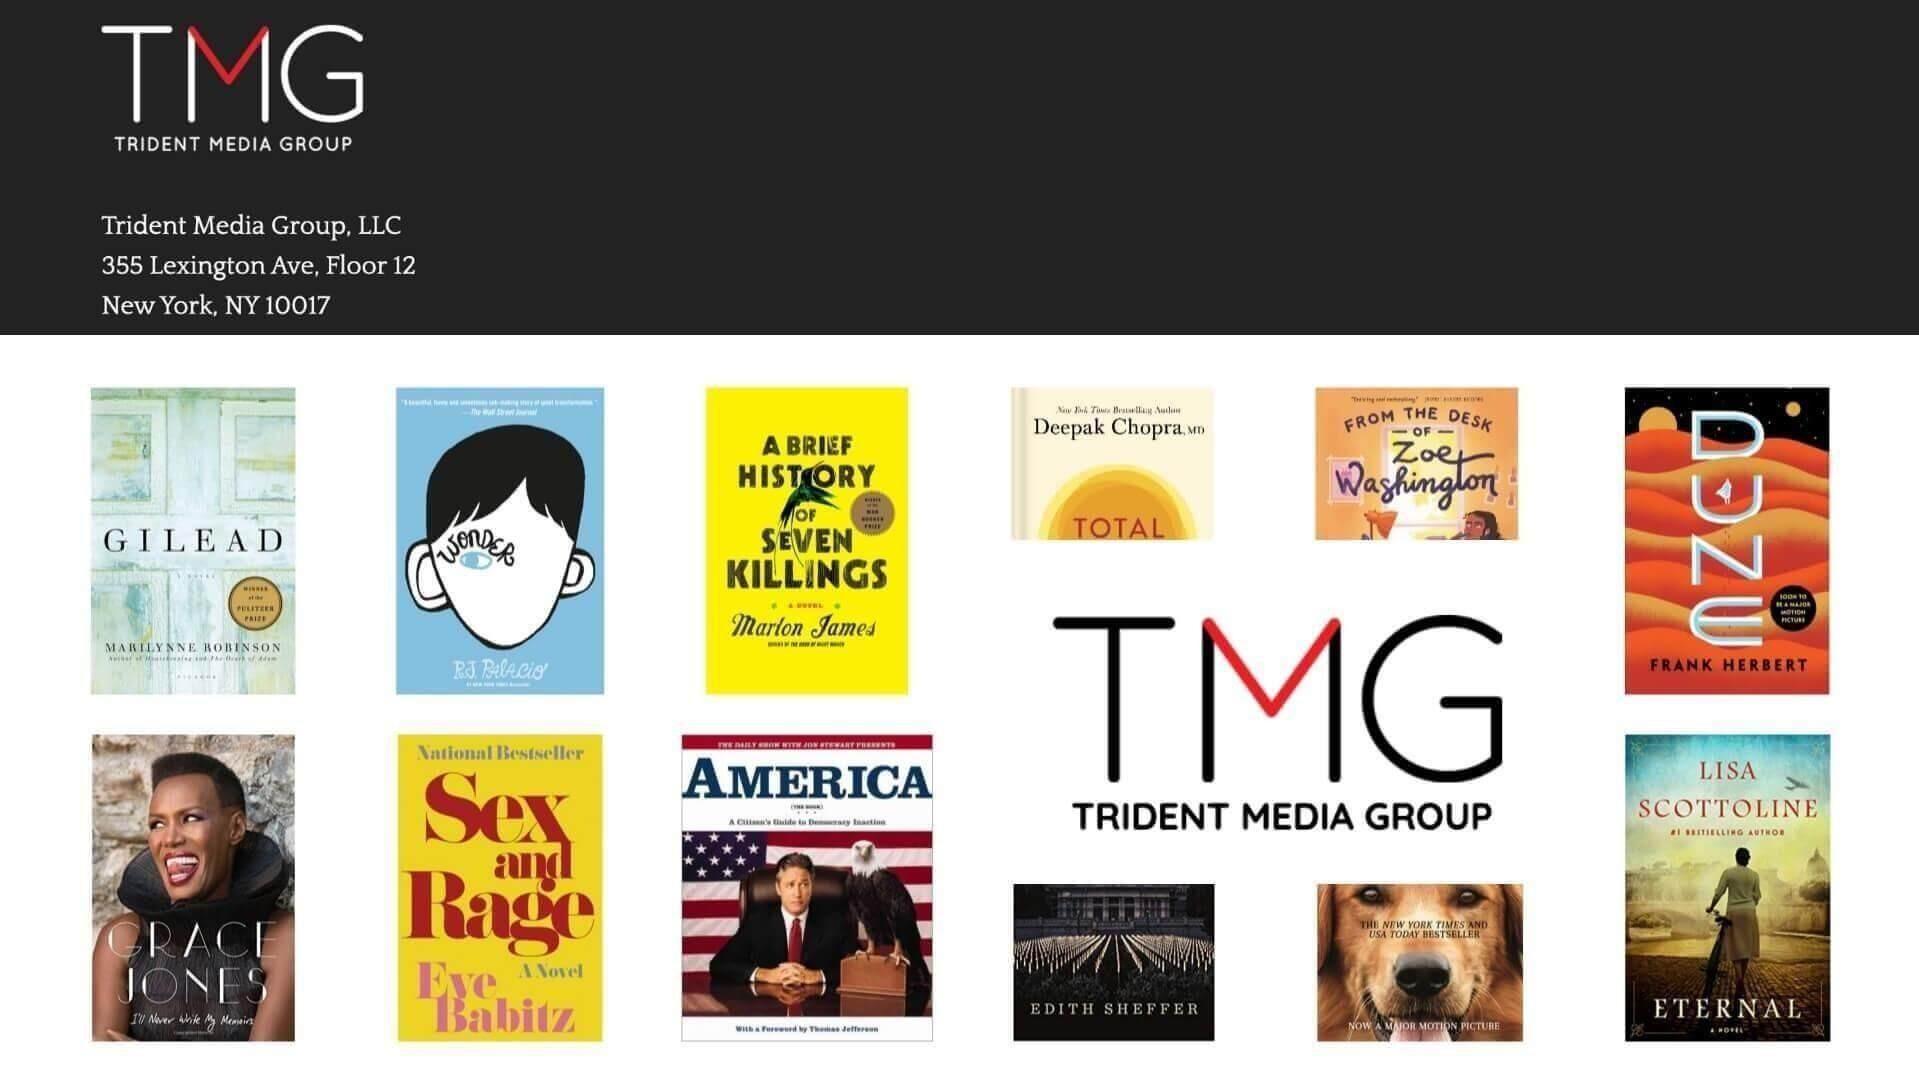 Trident Media Group